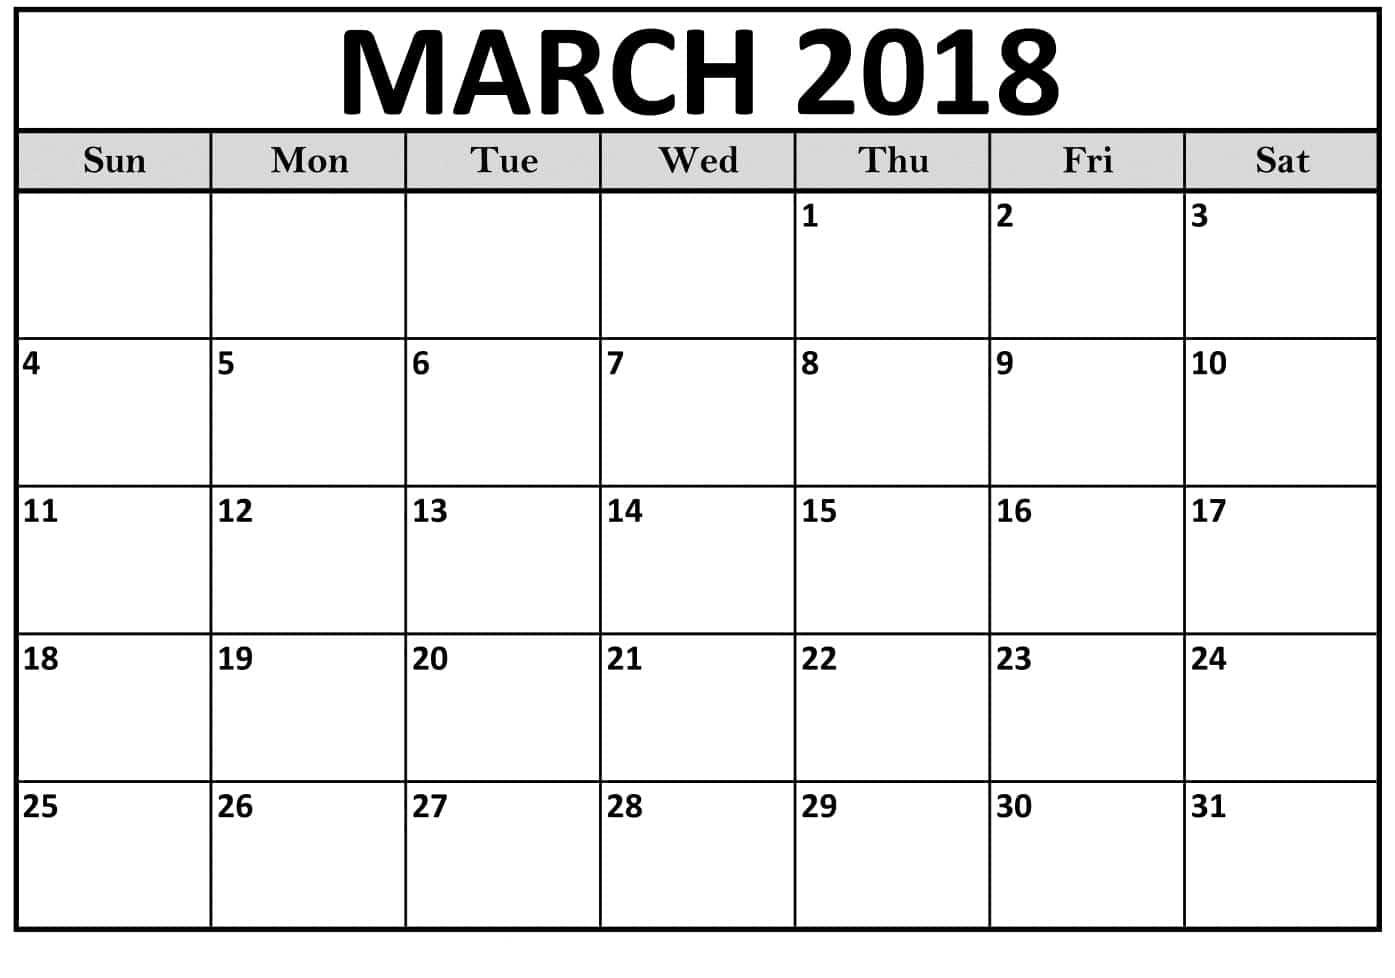 Calendar Printable March 2018 Calendar Printable March 2018